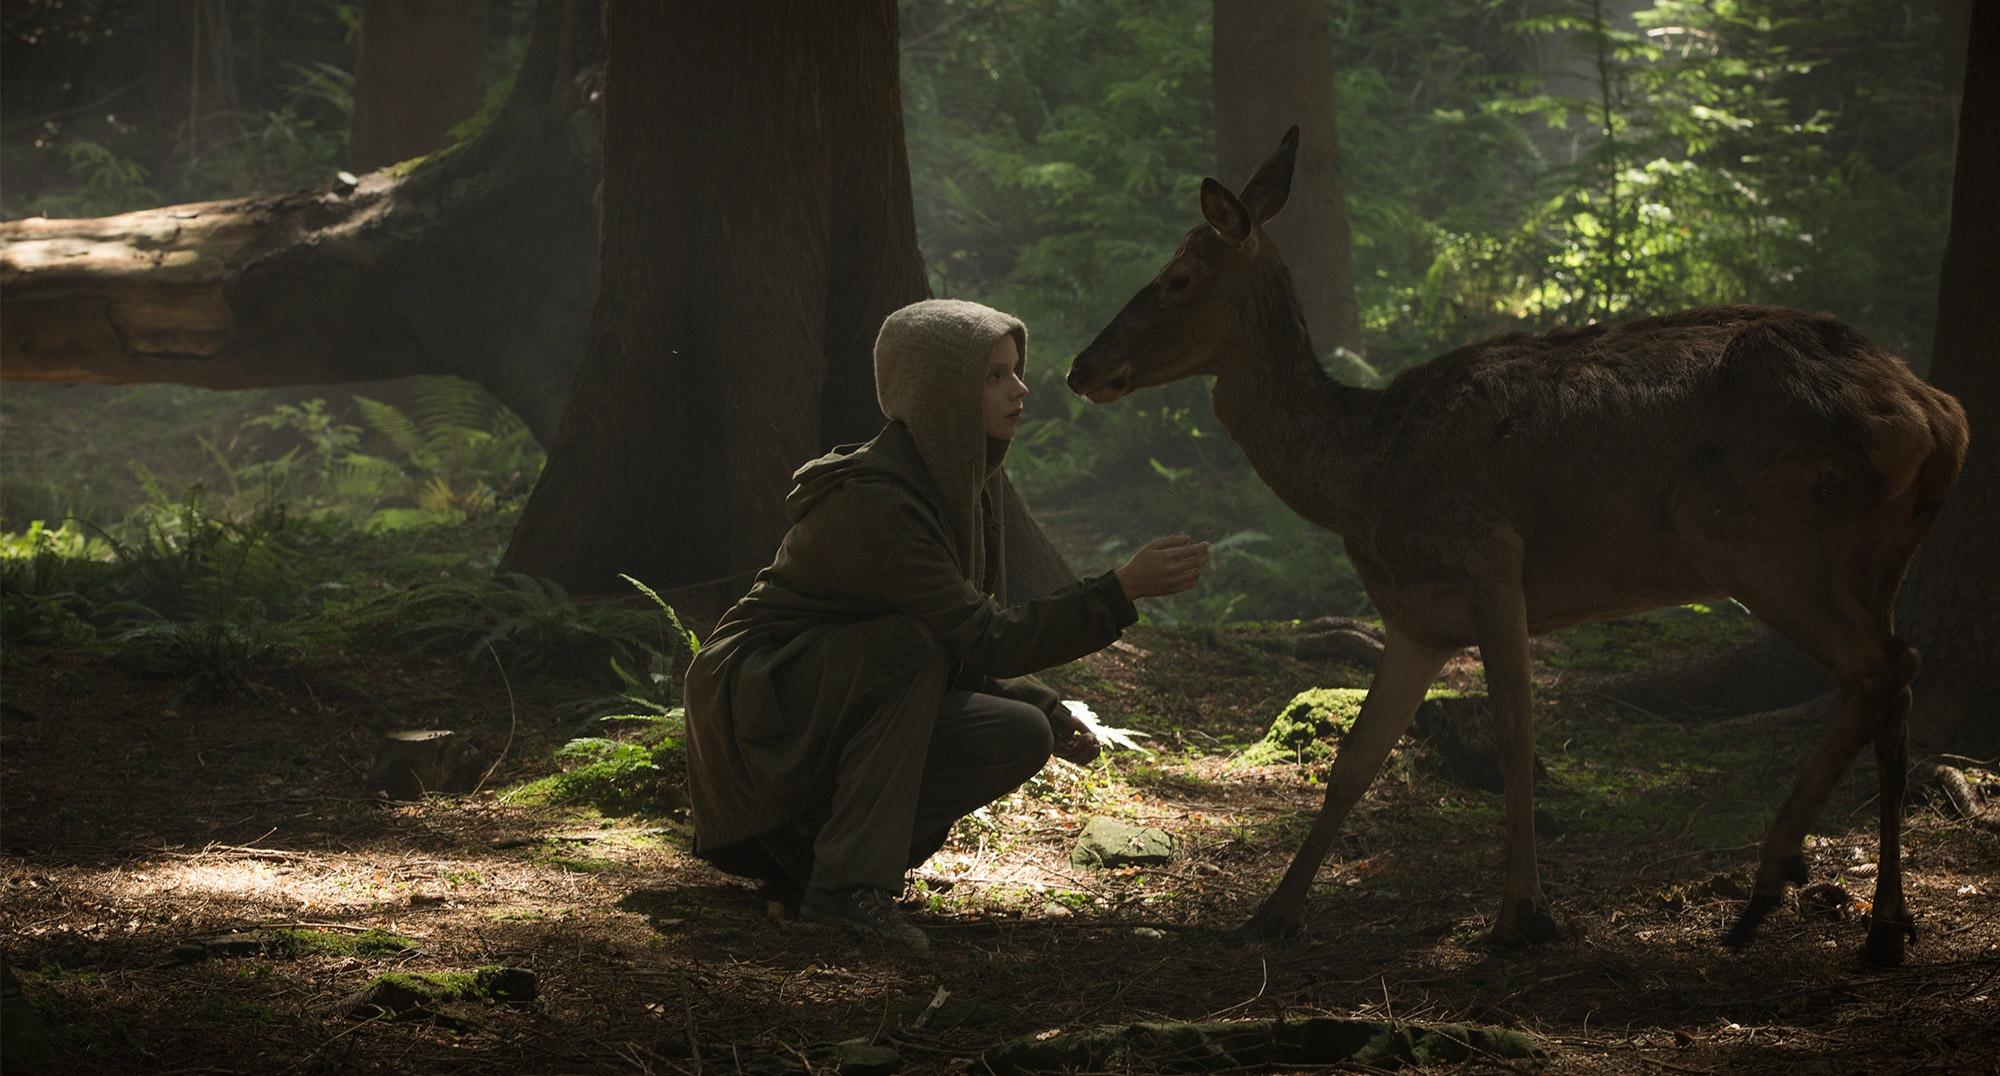 morgan-deer